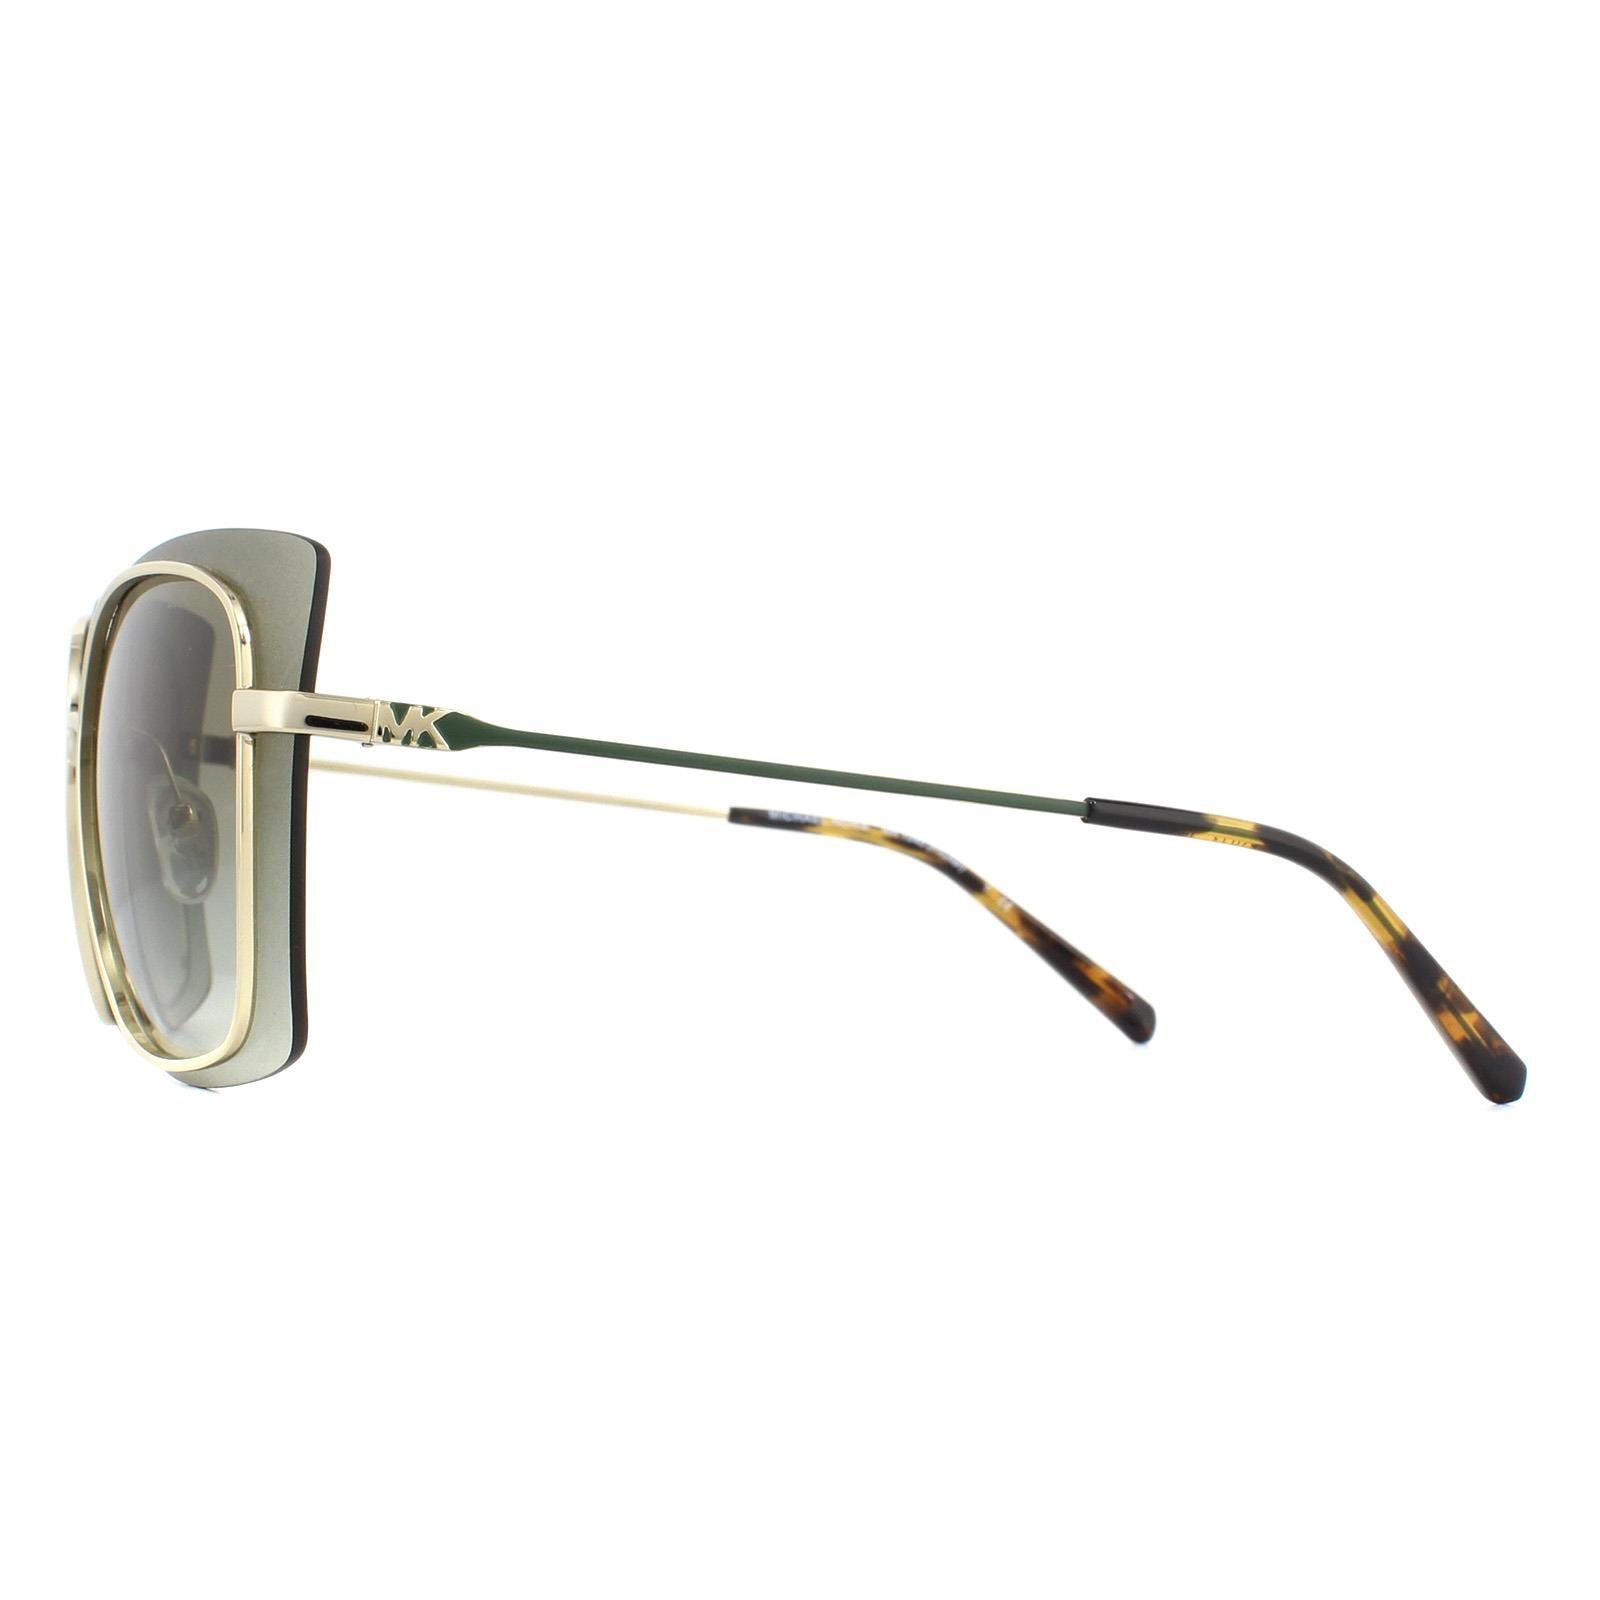 Michael Kors Sunglasses MK1040 Phuket 10148E Shiny Pale Gold Gray Mirrored Gradient